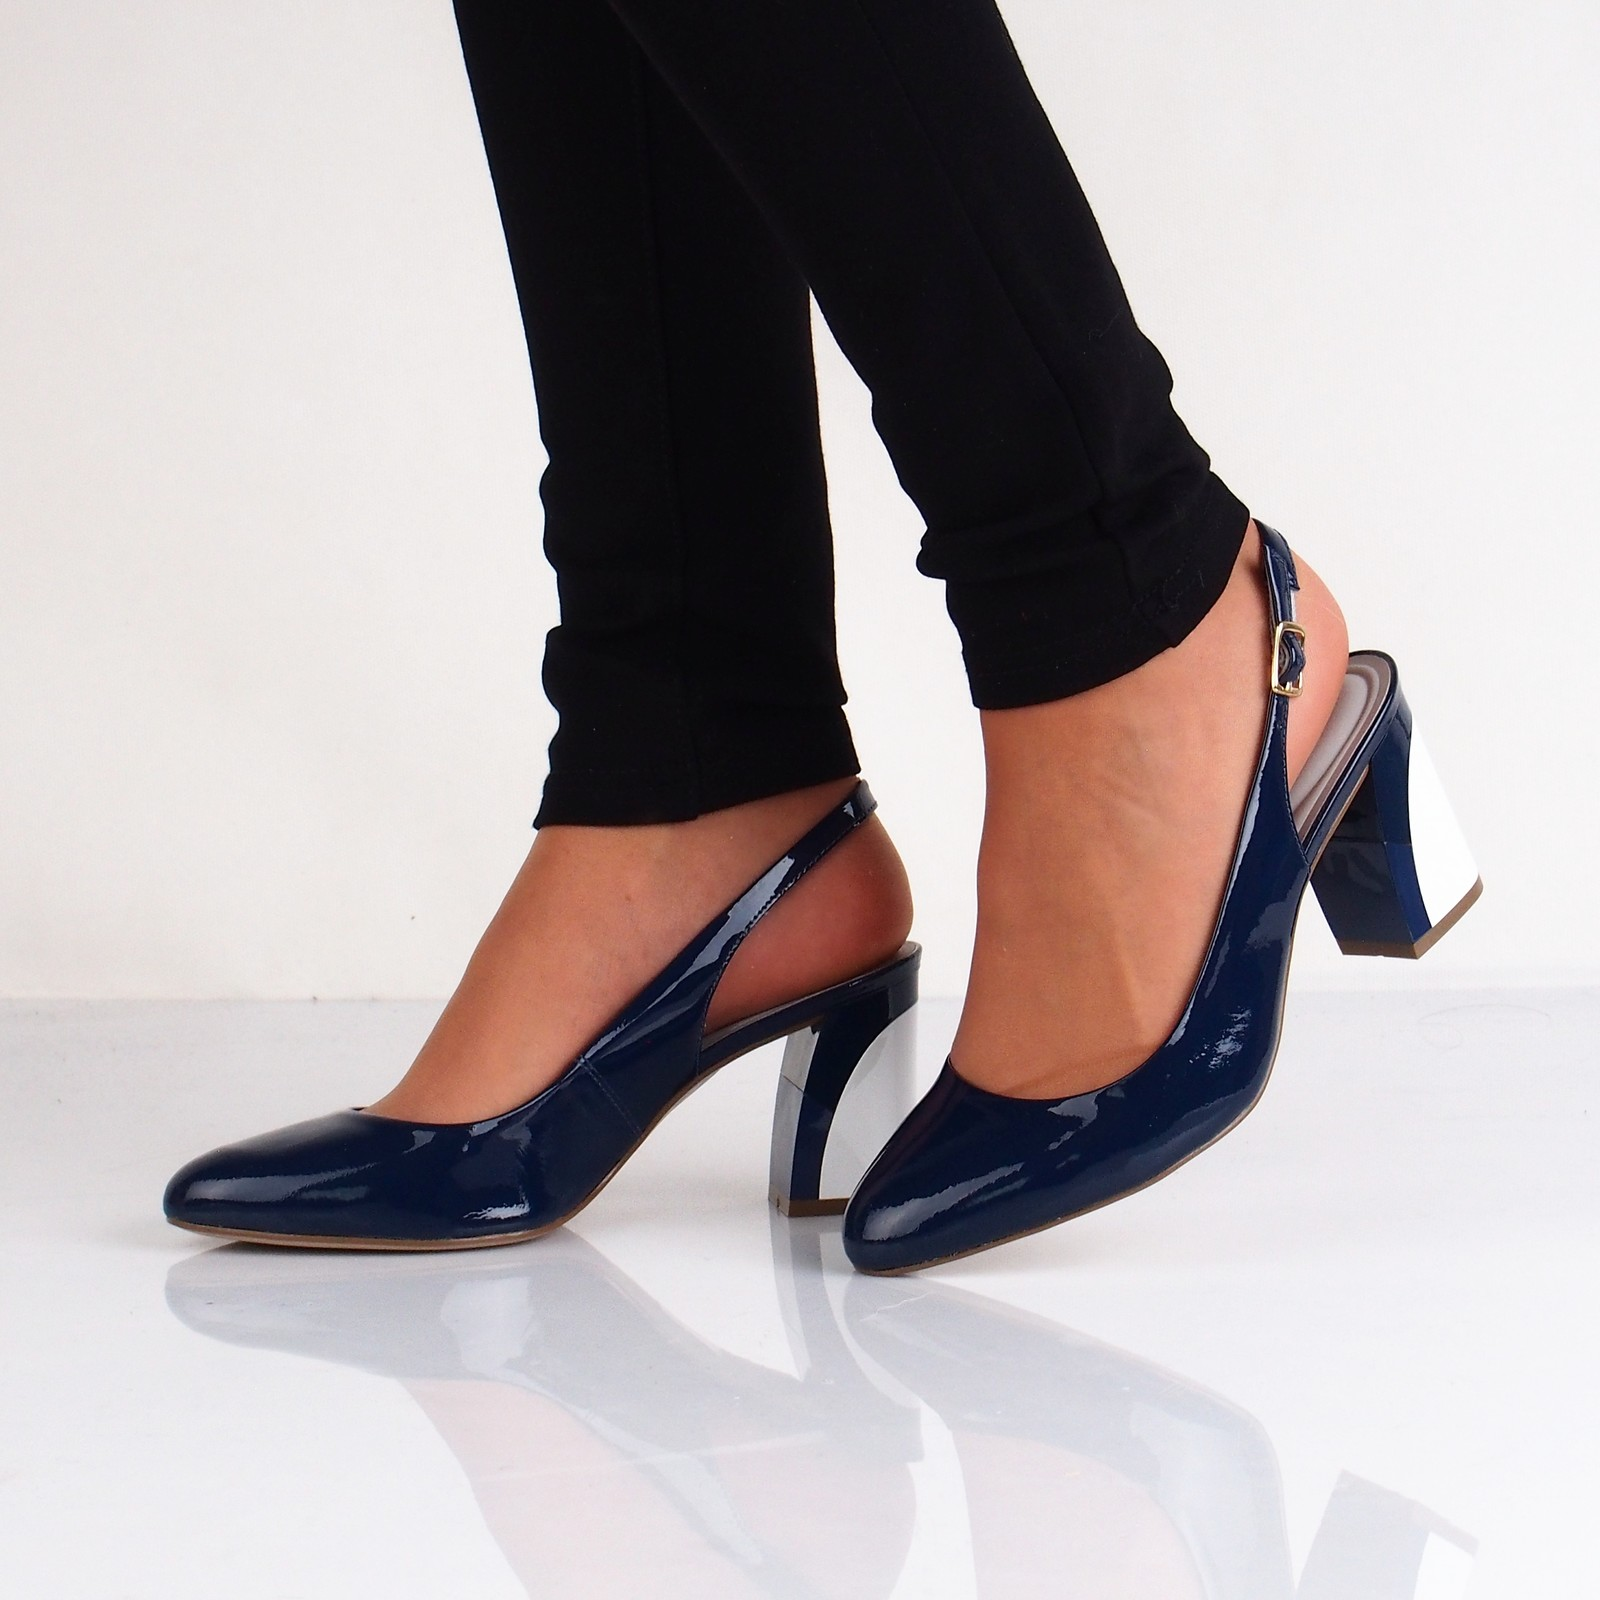 5a3037befd72 Olivia shoes dámske lakované sandále s remienkom - modré ...